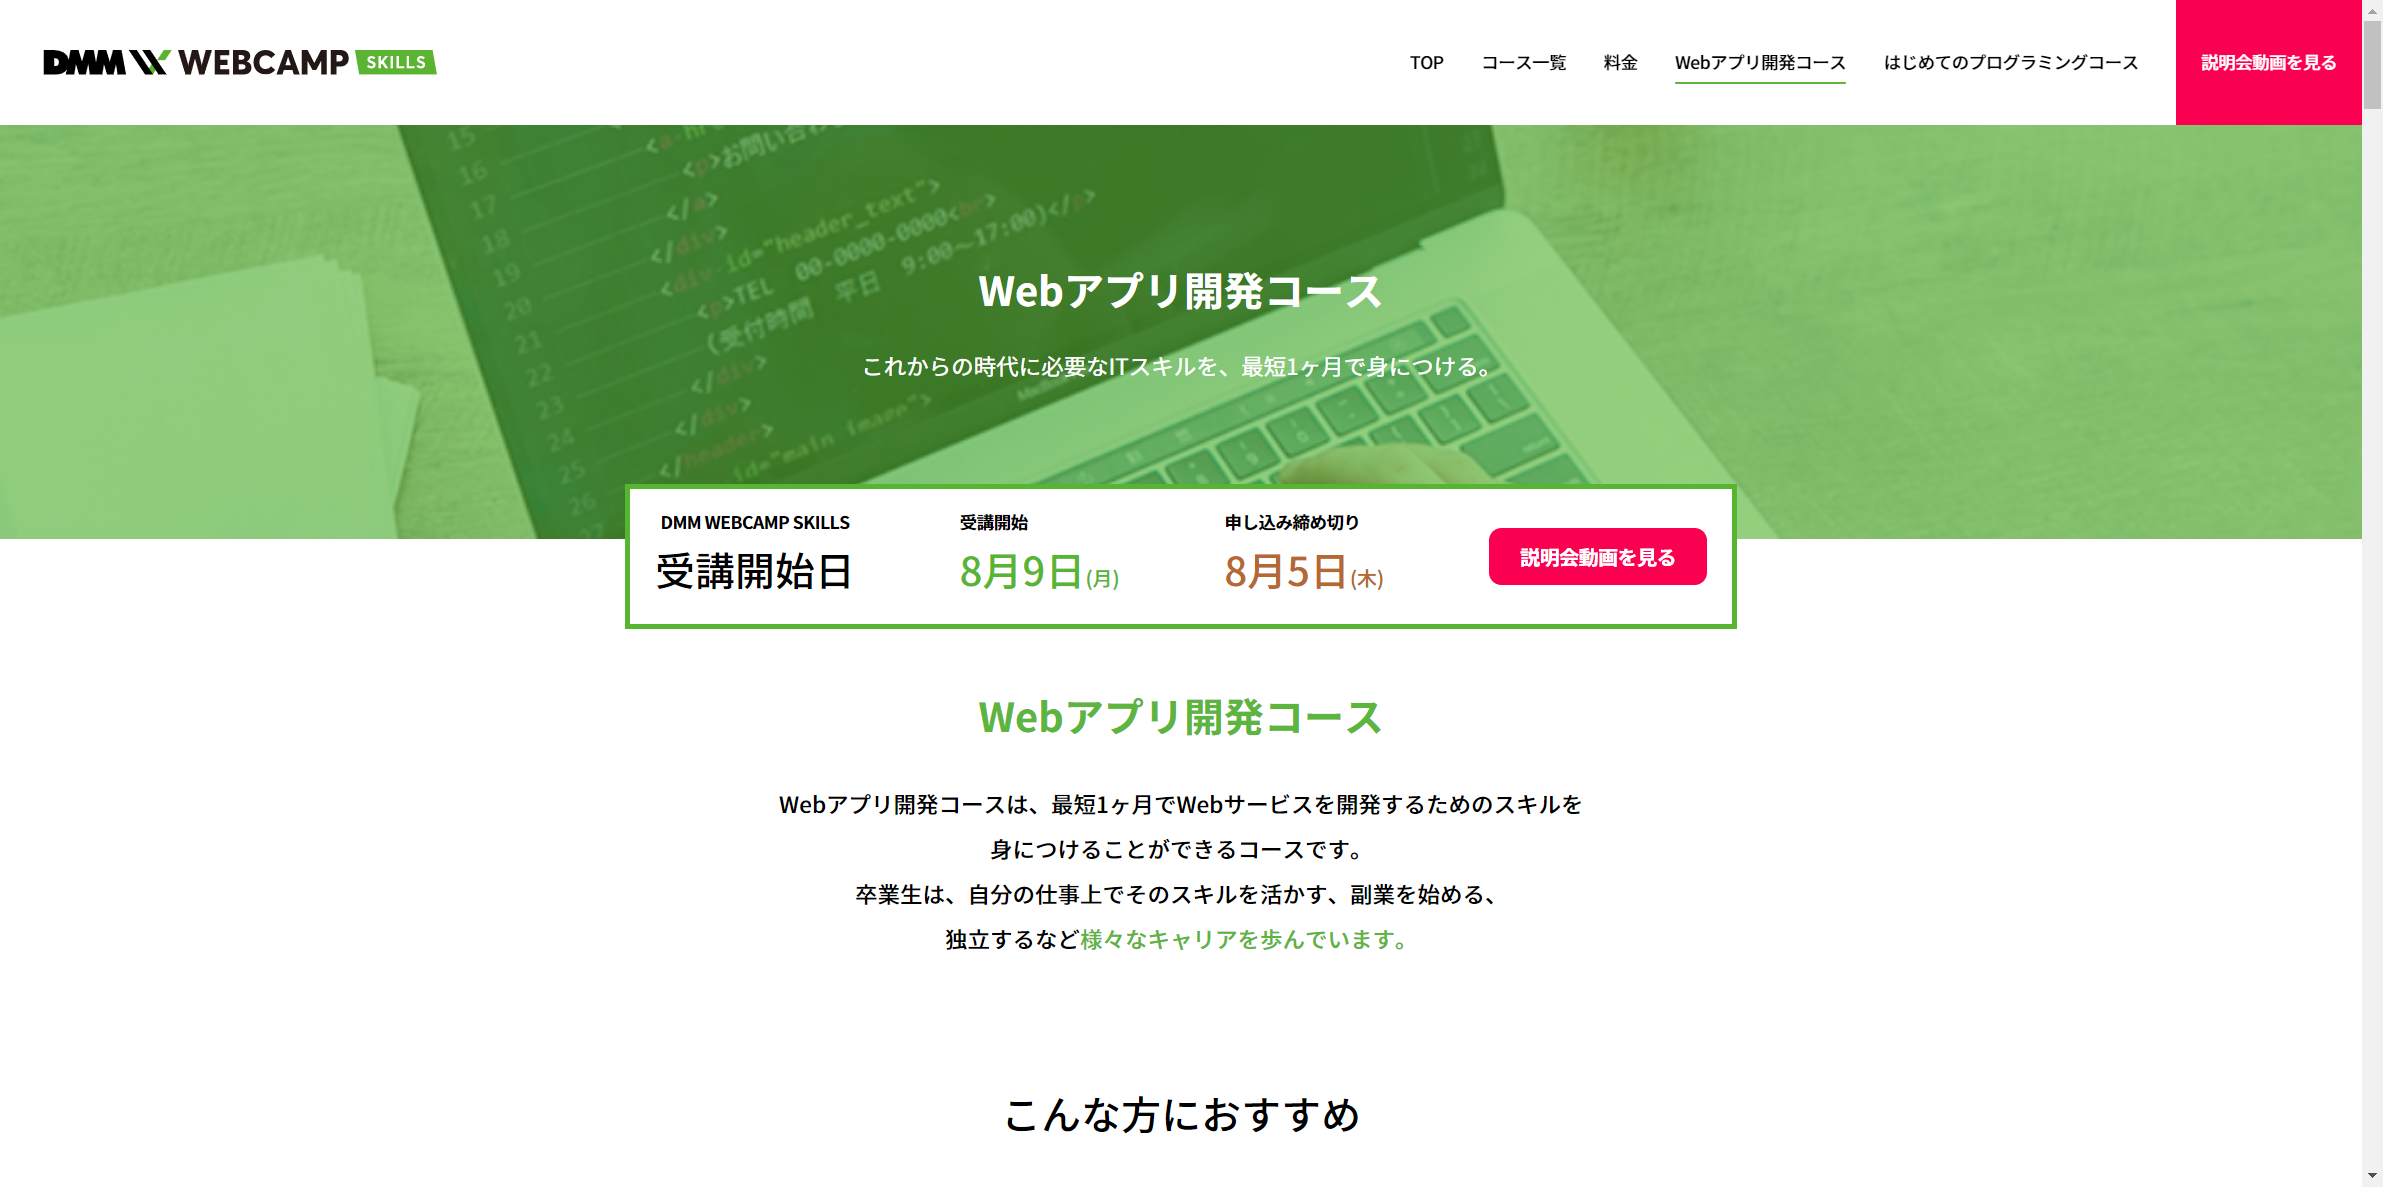 DMM WEBCAMP SKILLS Webアプリ開発コース